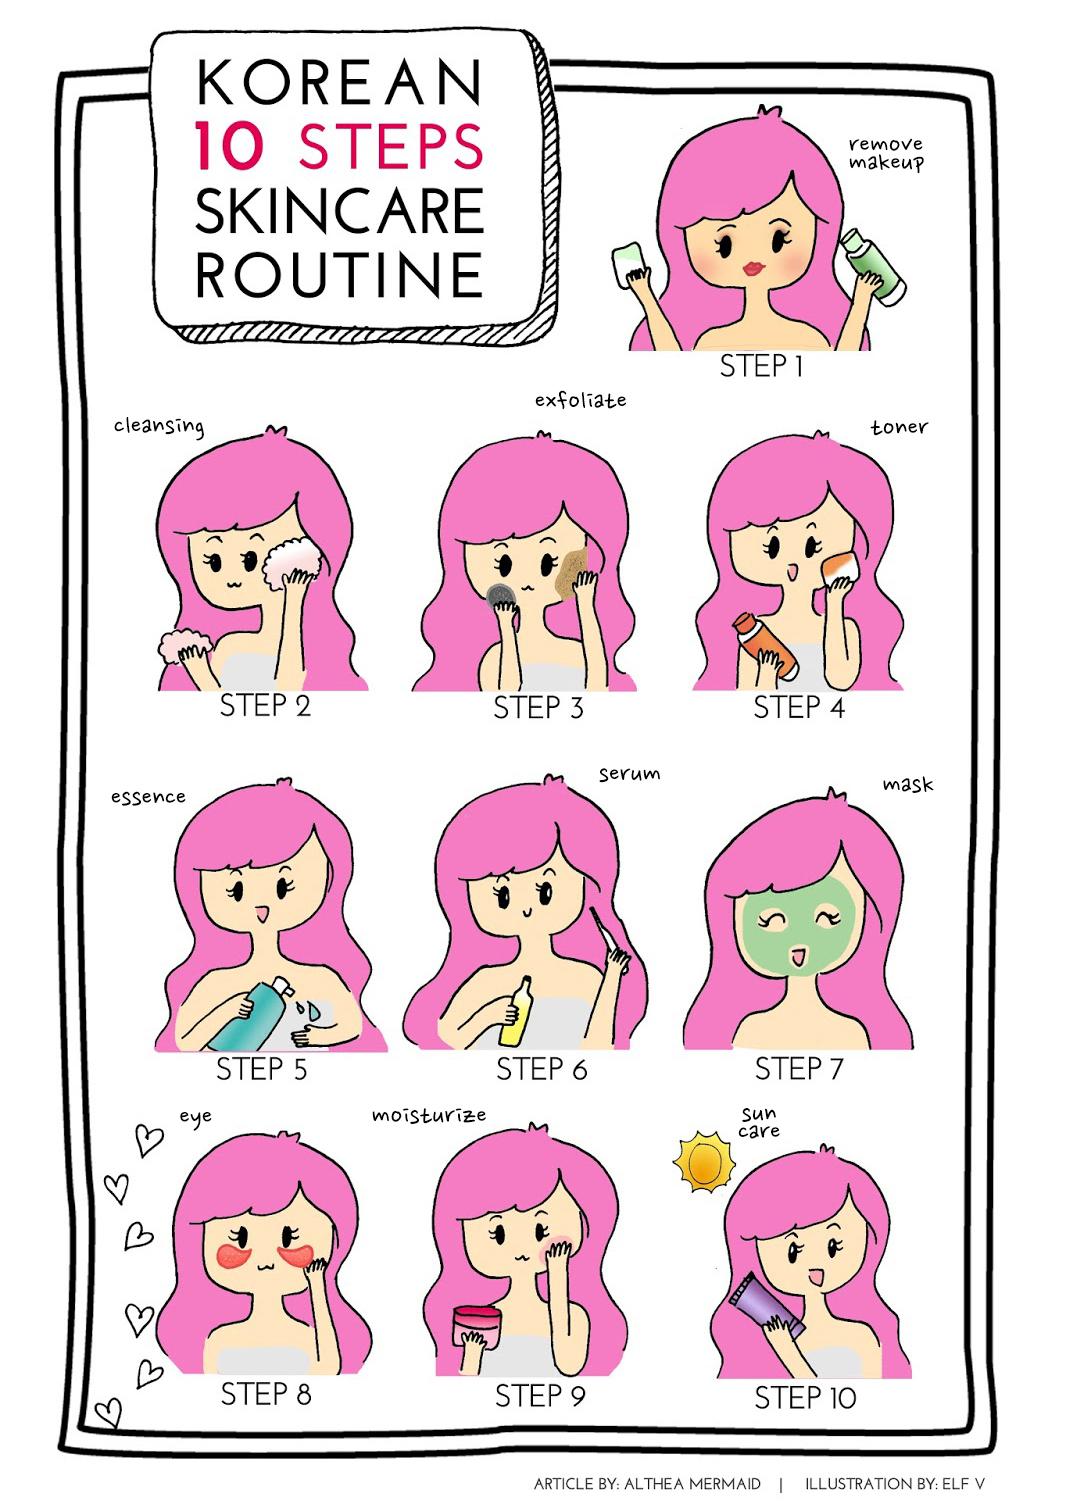 Skincare routine malaysia blog